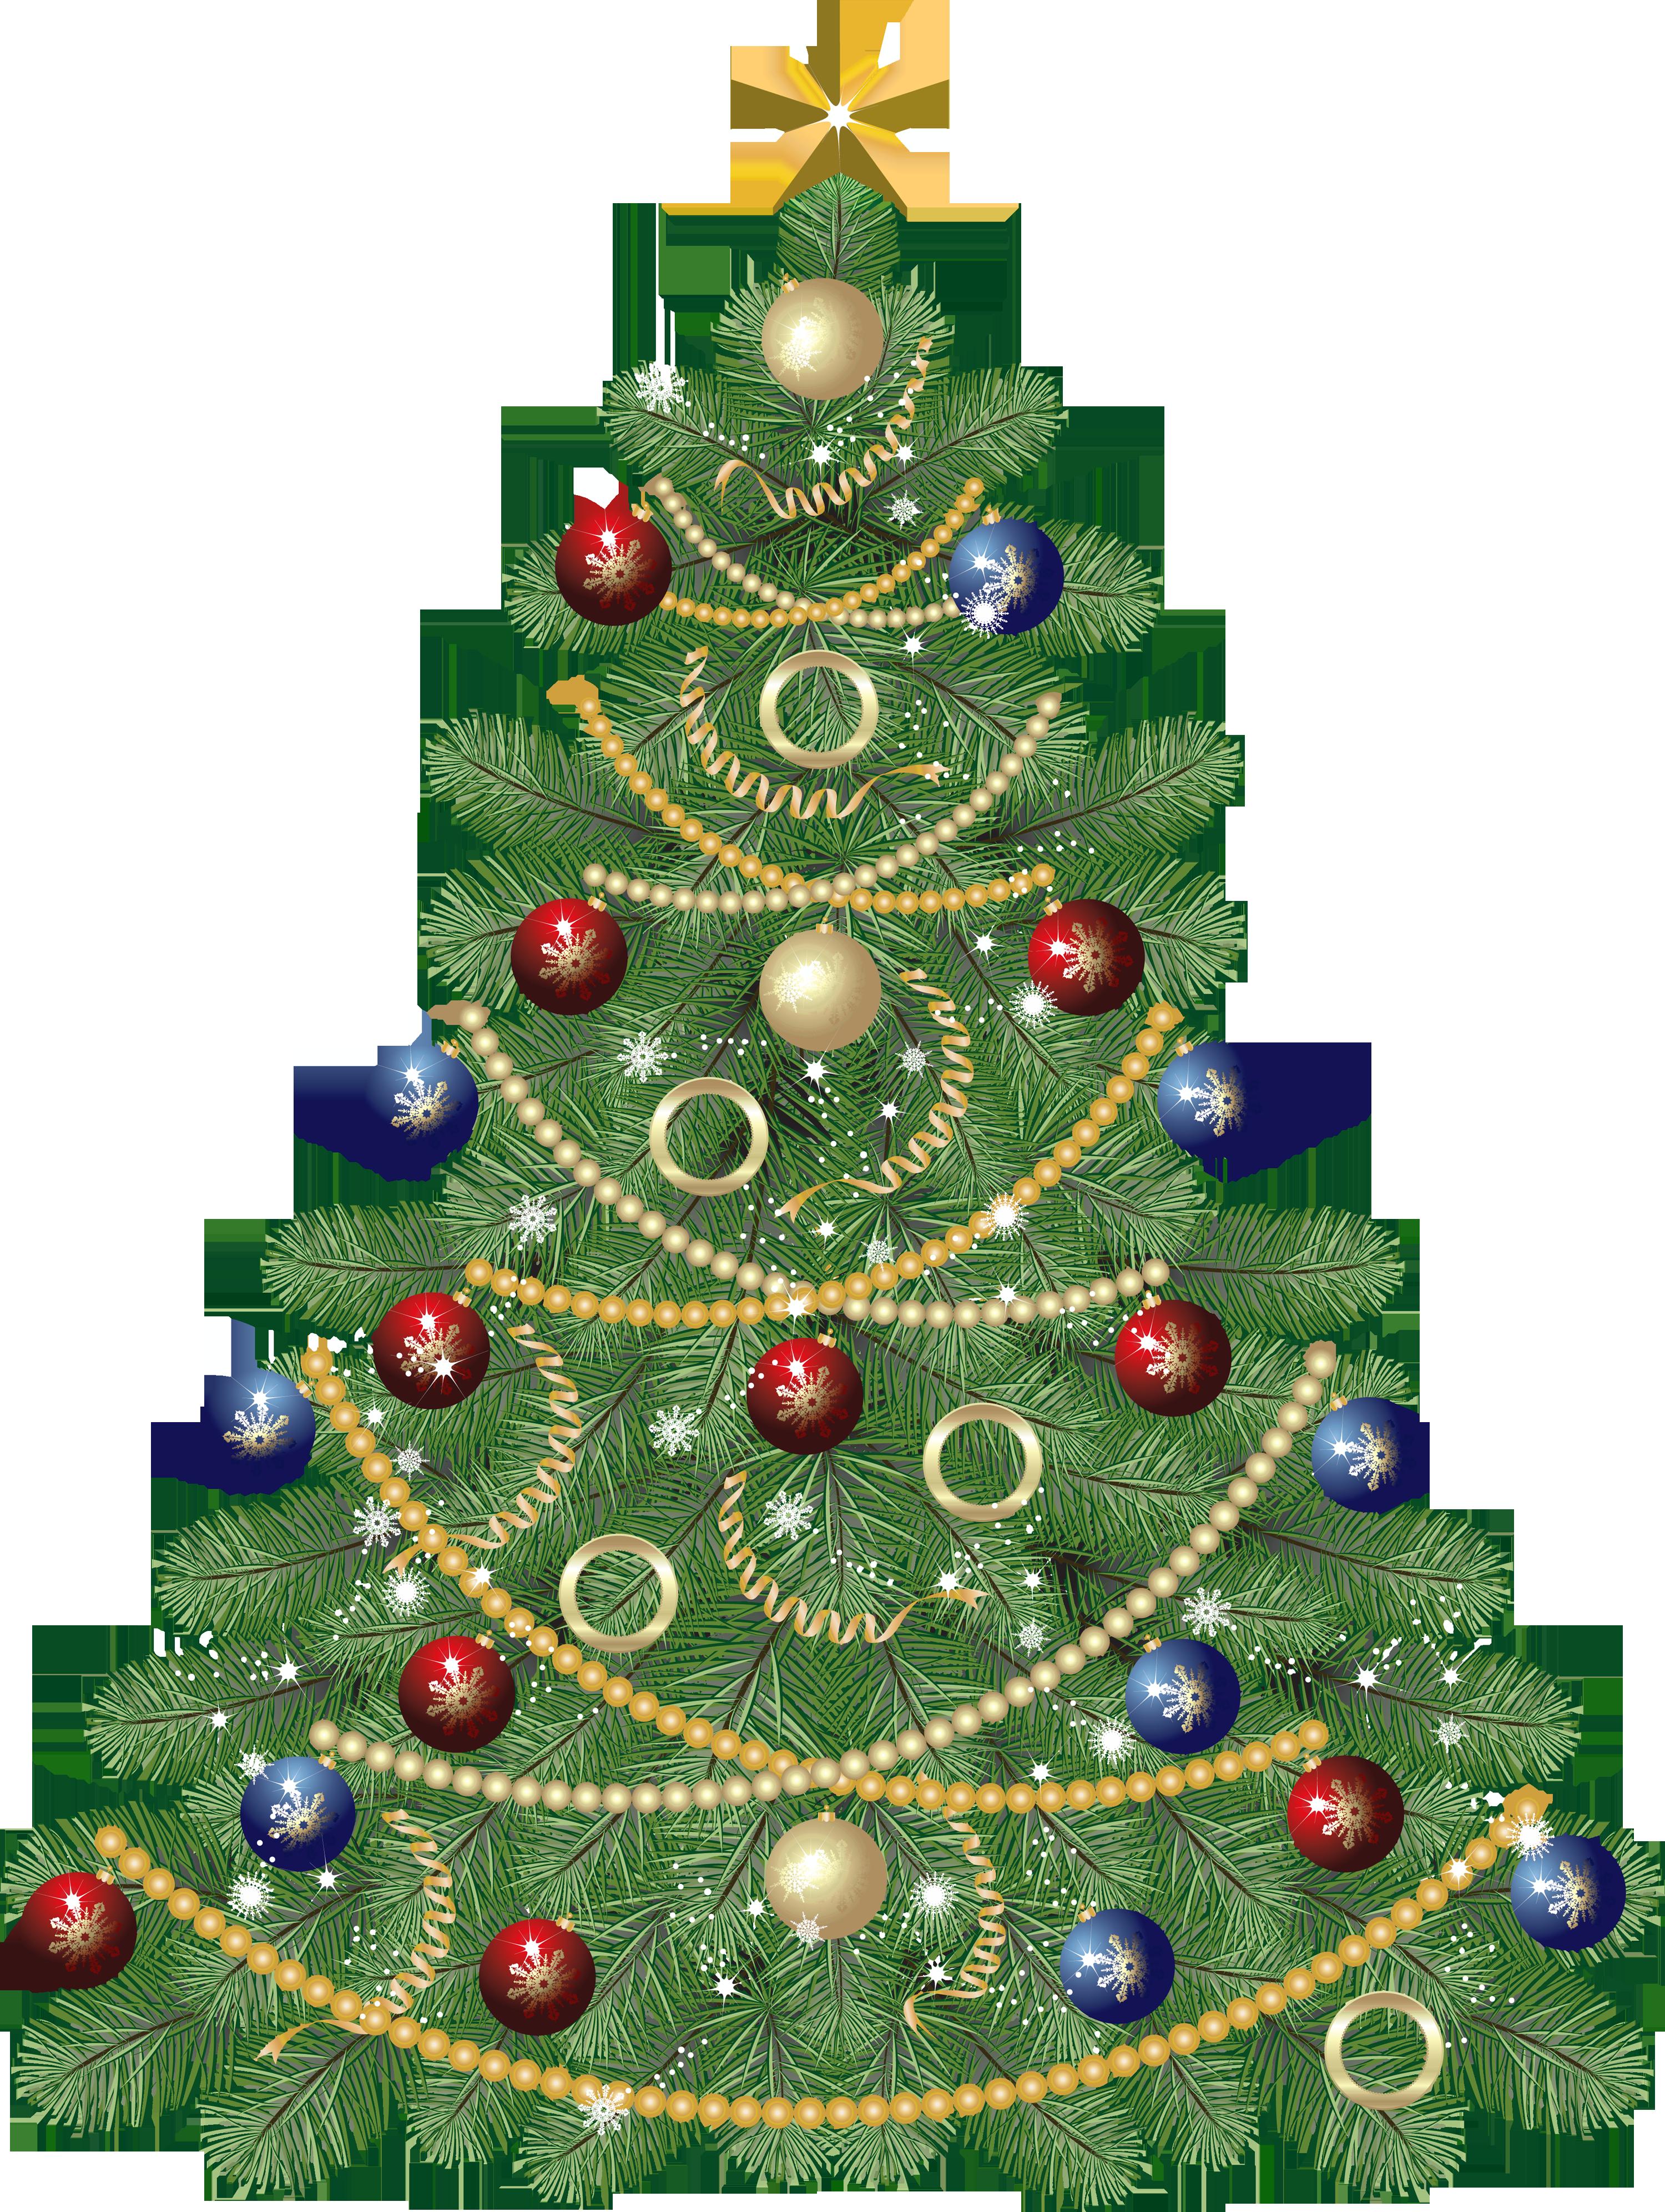 Free Christmas Tree Clipart Public Domai-Free christmas tree clipart public domain christmas clip art 4-17